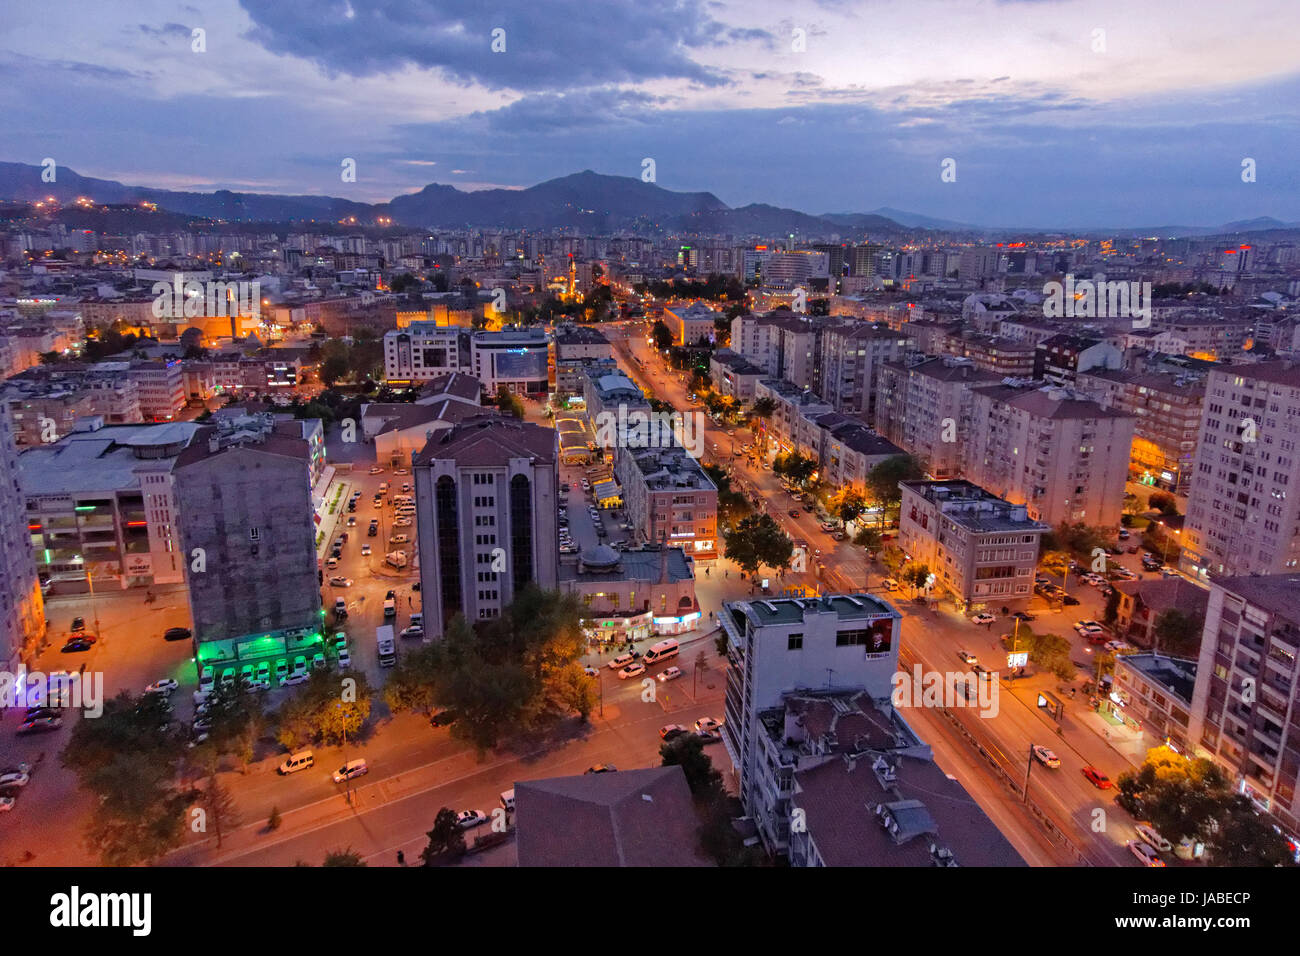 City centre of Kayseri, Kayseri Province, Turkey.A centre for visiting Cappodocia. - Stock Image